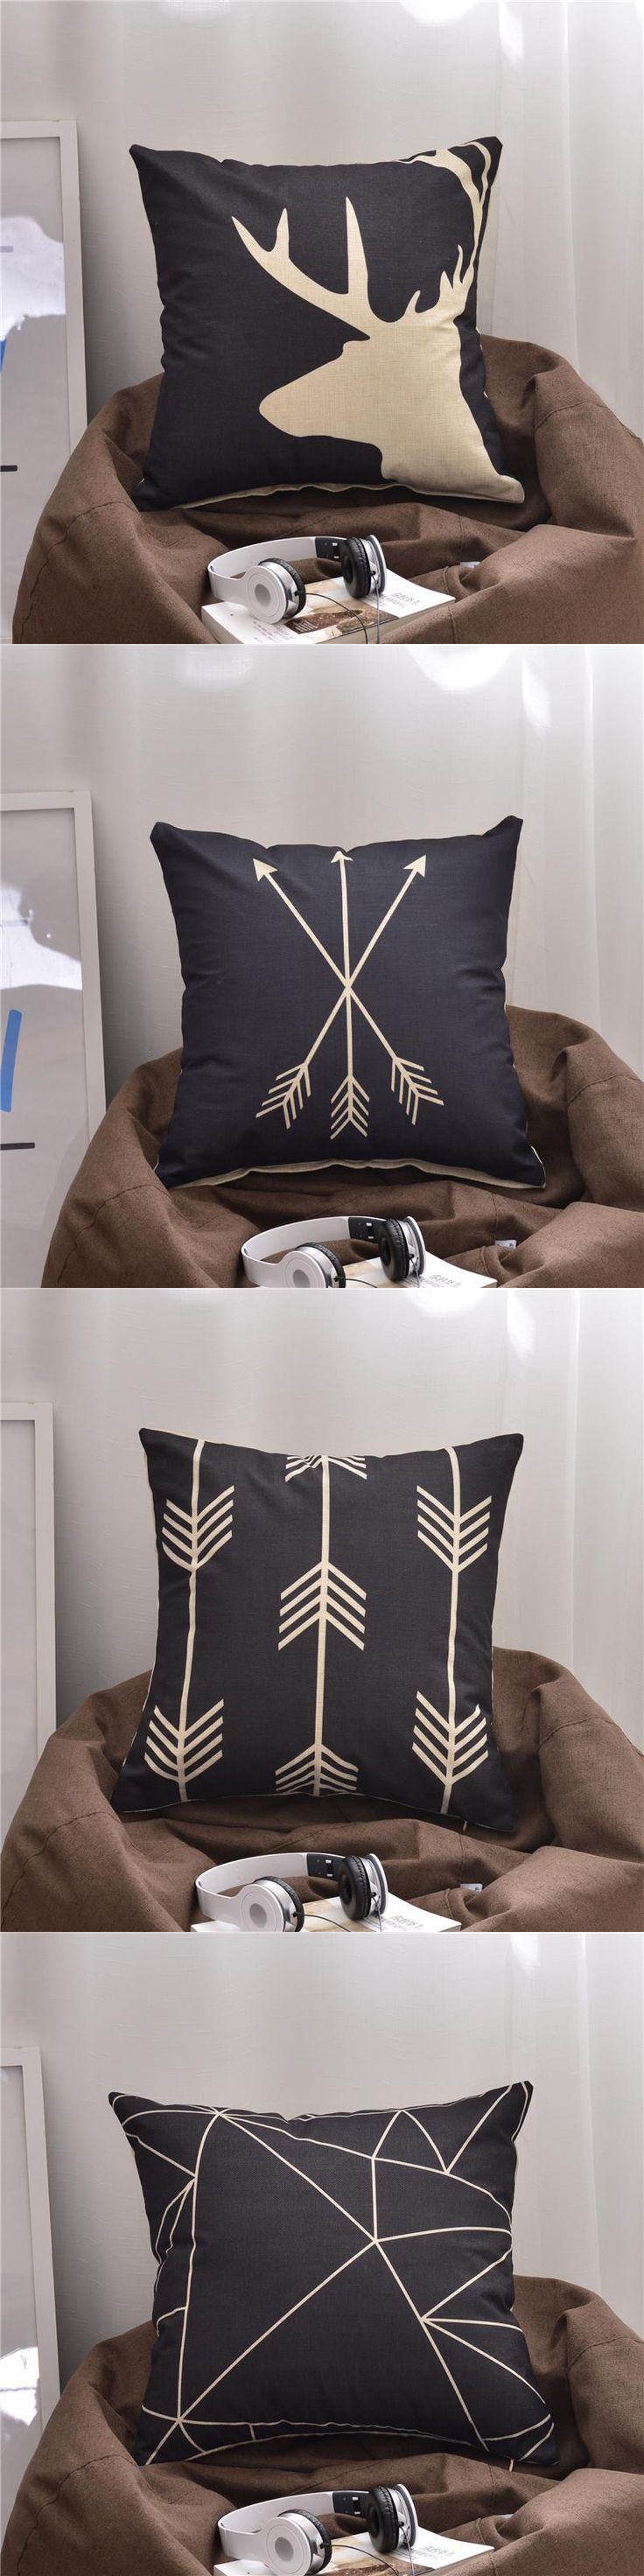 Geometric Cushion Seat Bolster Home Decor Pillow Car Cushion Sofa Pillows 18x18in Office Chair Seat Back Support